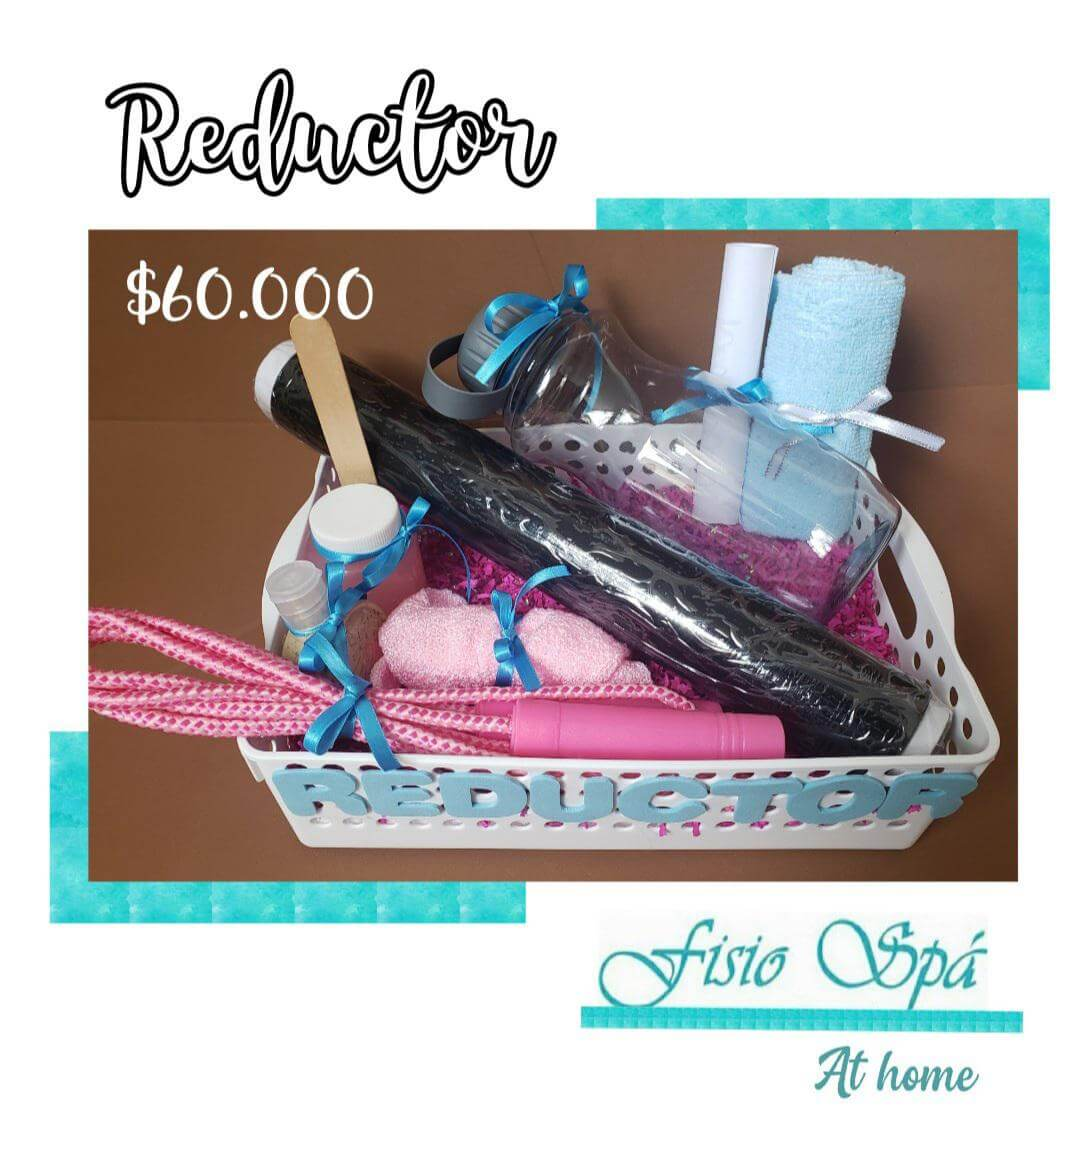 Kit Reductor